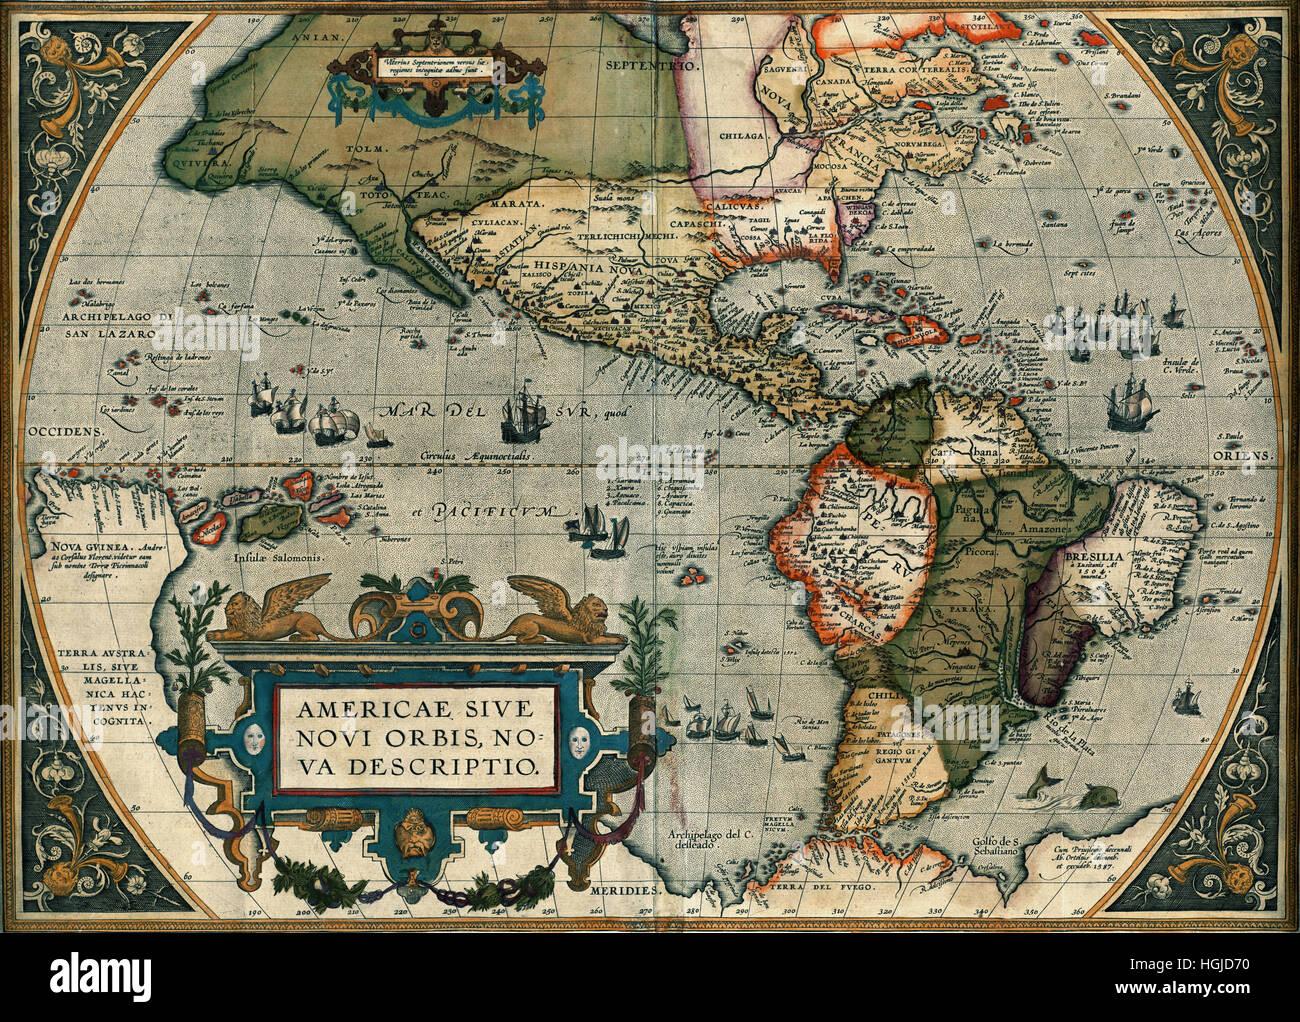 Map Of America 1587 Stock Photo: 130712596   Alamy